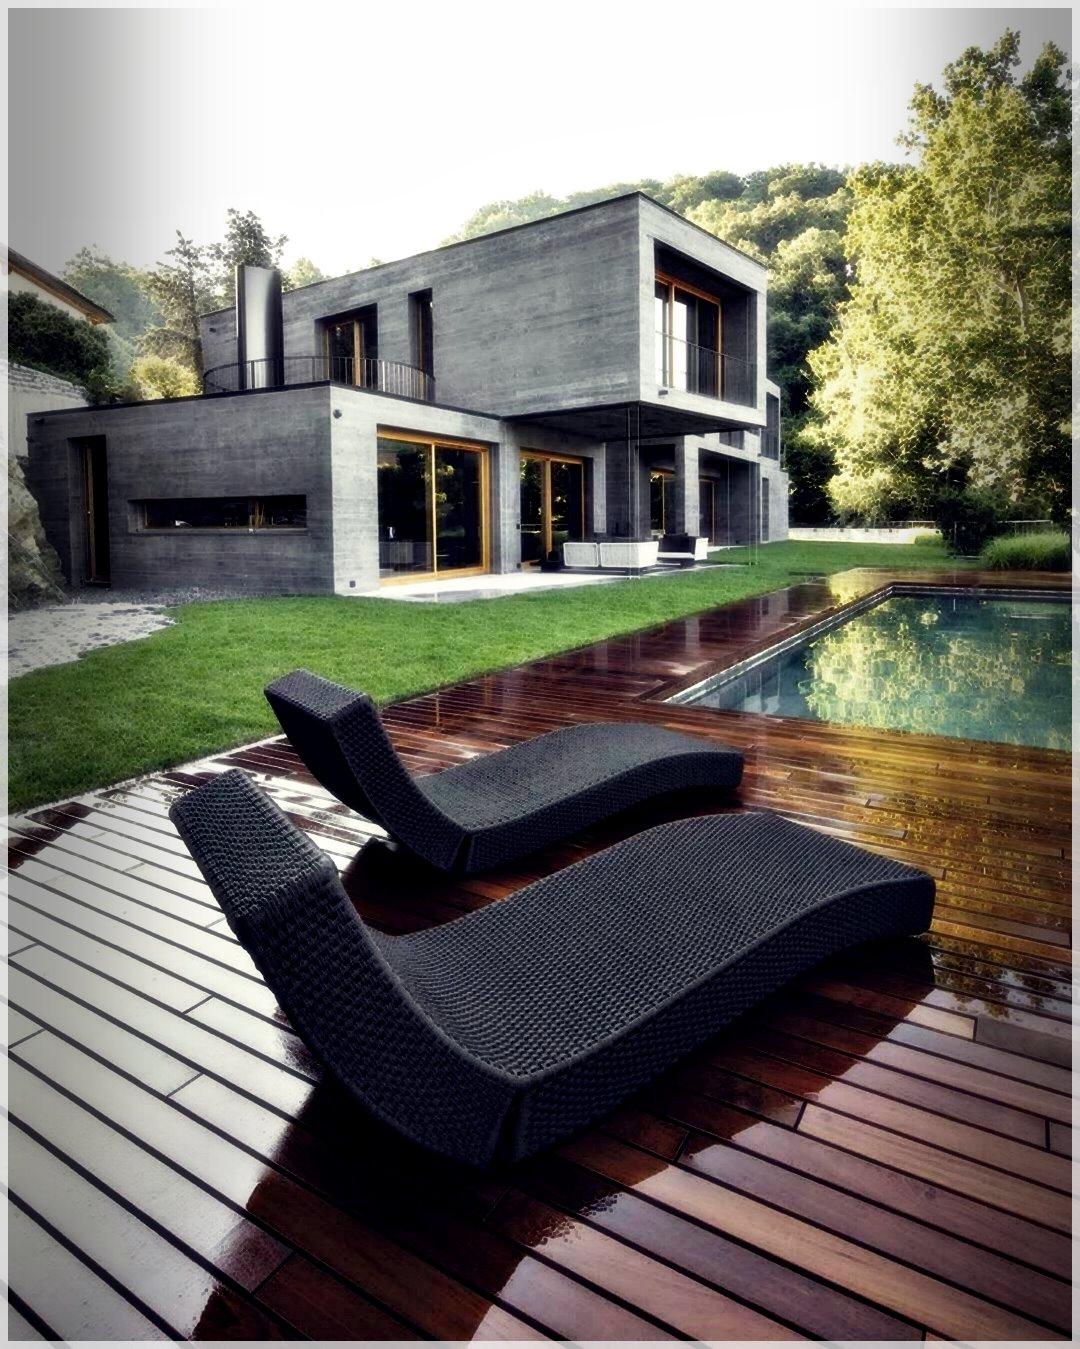 ModernHouse-97687429990